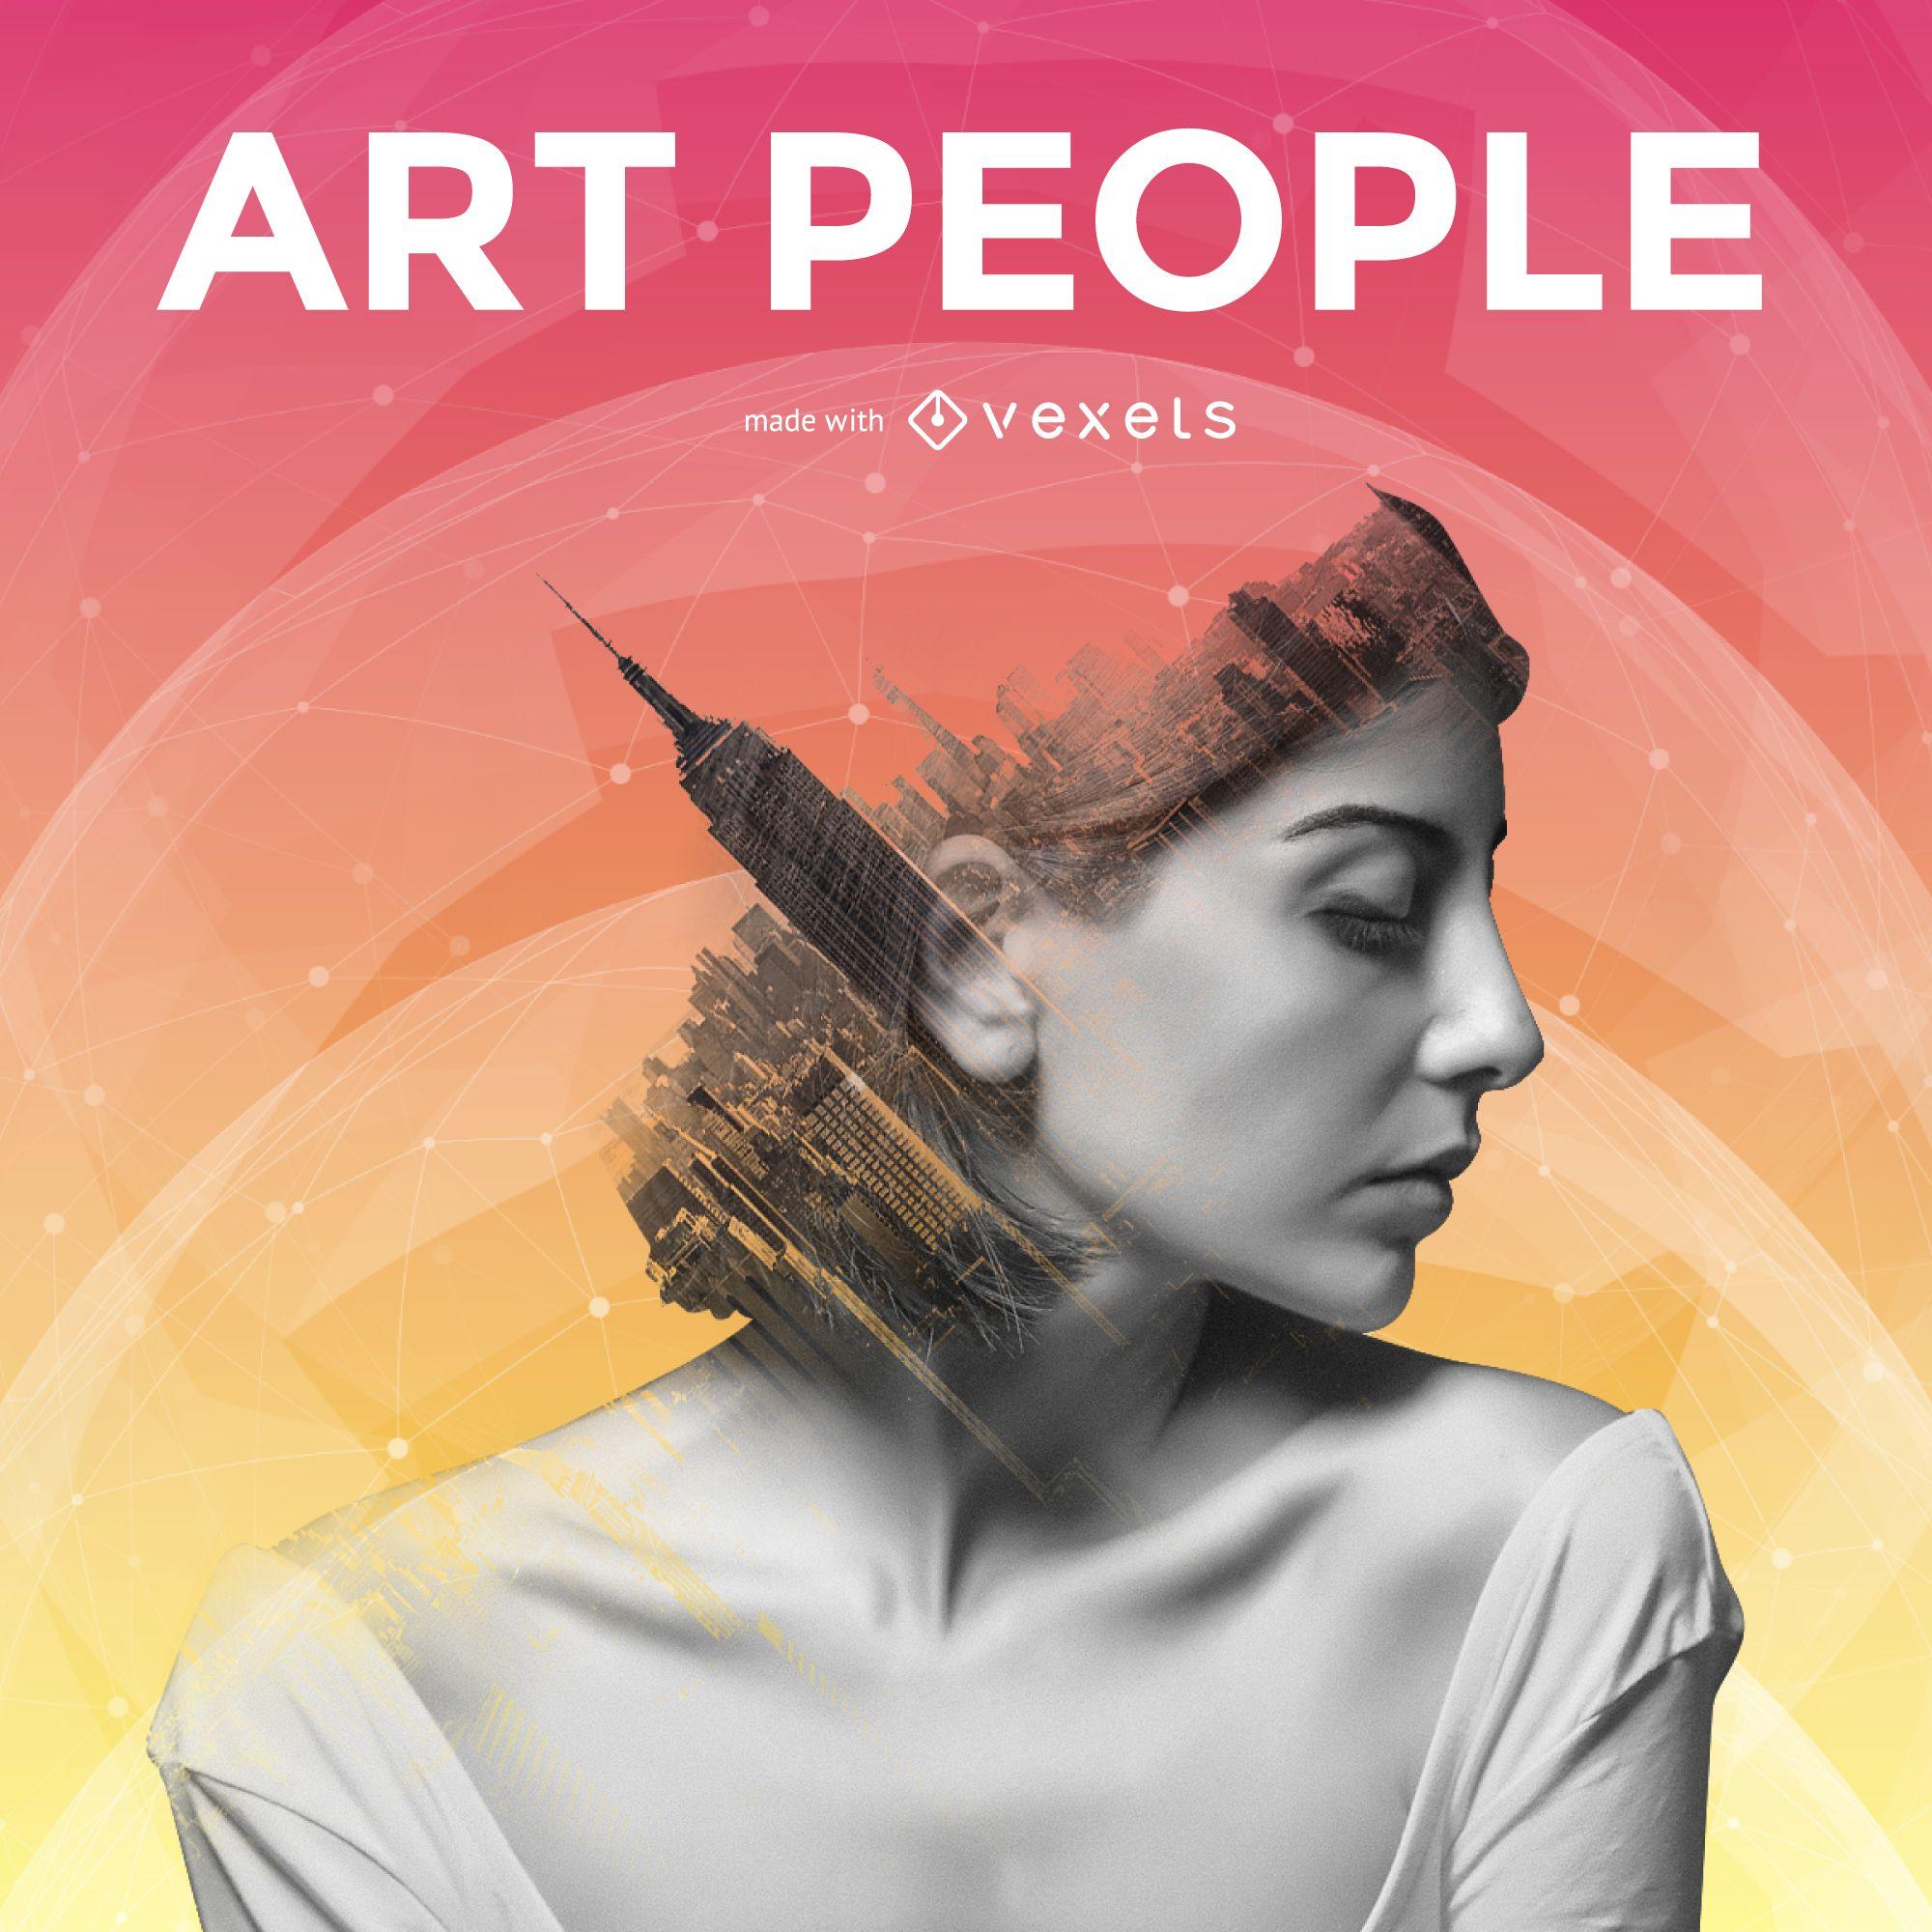 Poster design generator - Artistic Poster Generator Download Large Image 2000x2000px